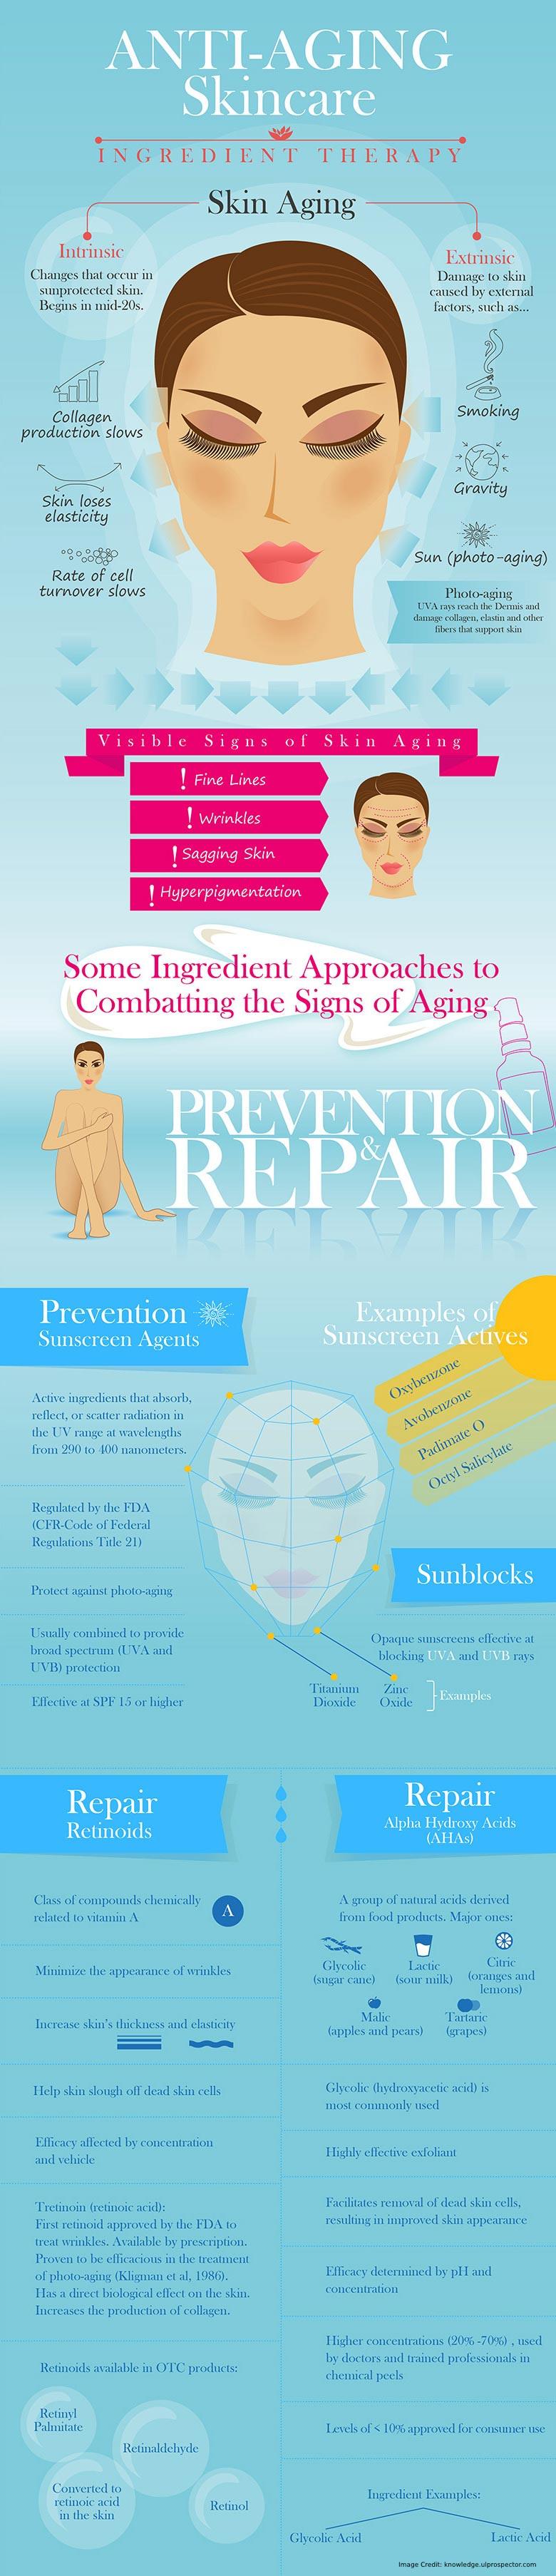 Anti-aging Skin Care Info